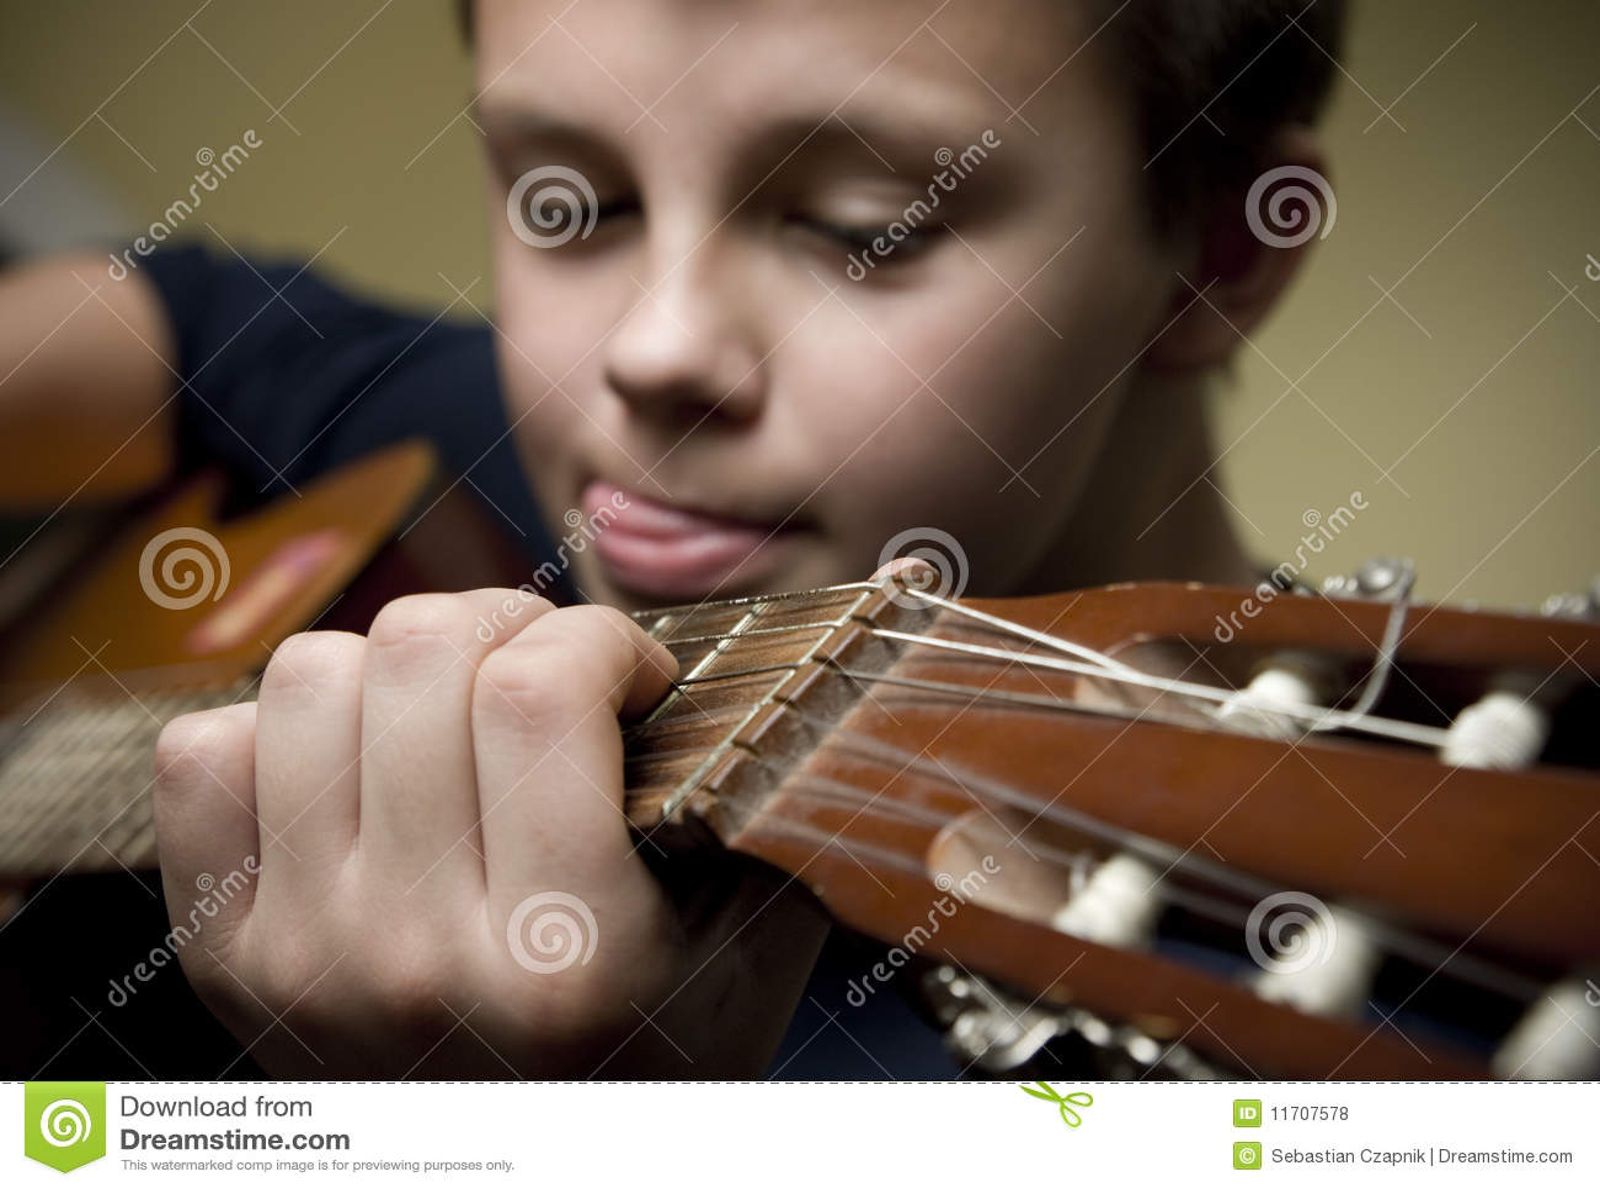 Boy Playing Guitar Royalty Free Stock Photos - Image: 11707578